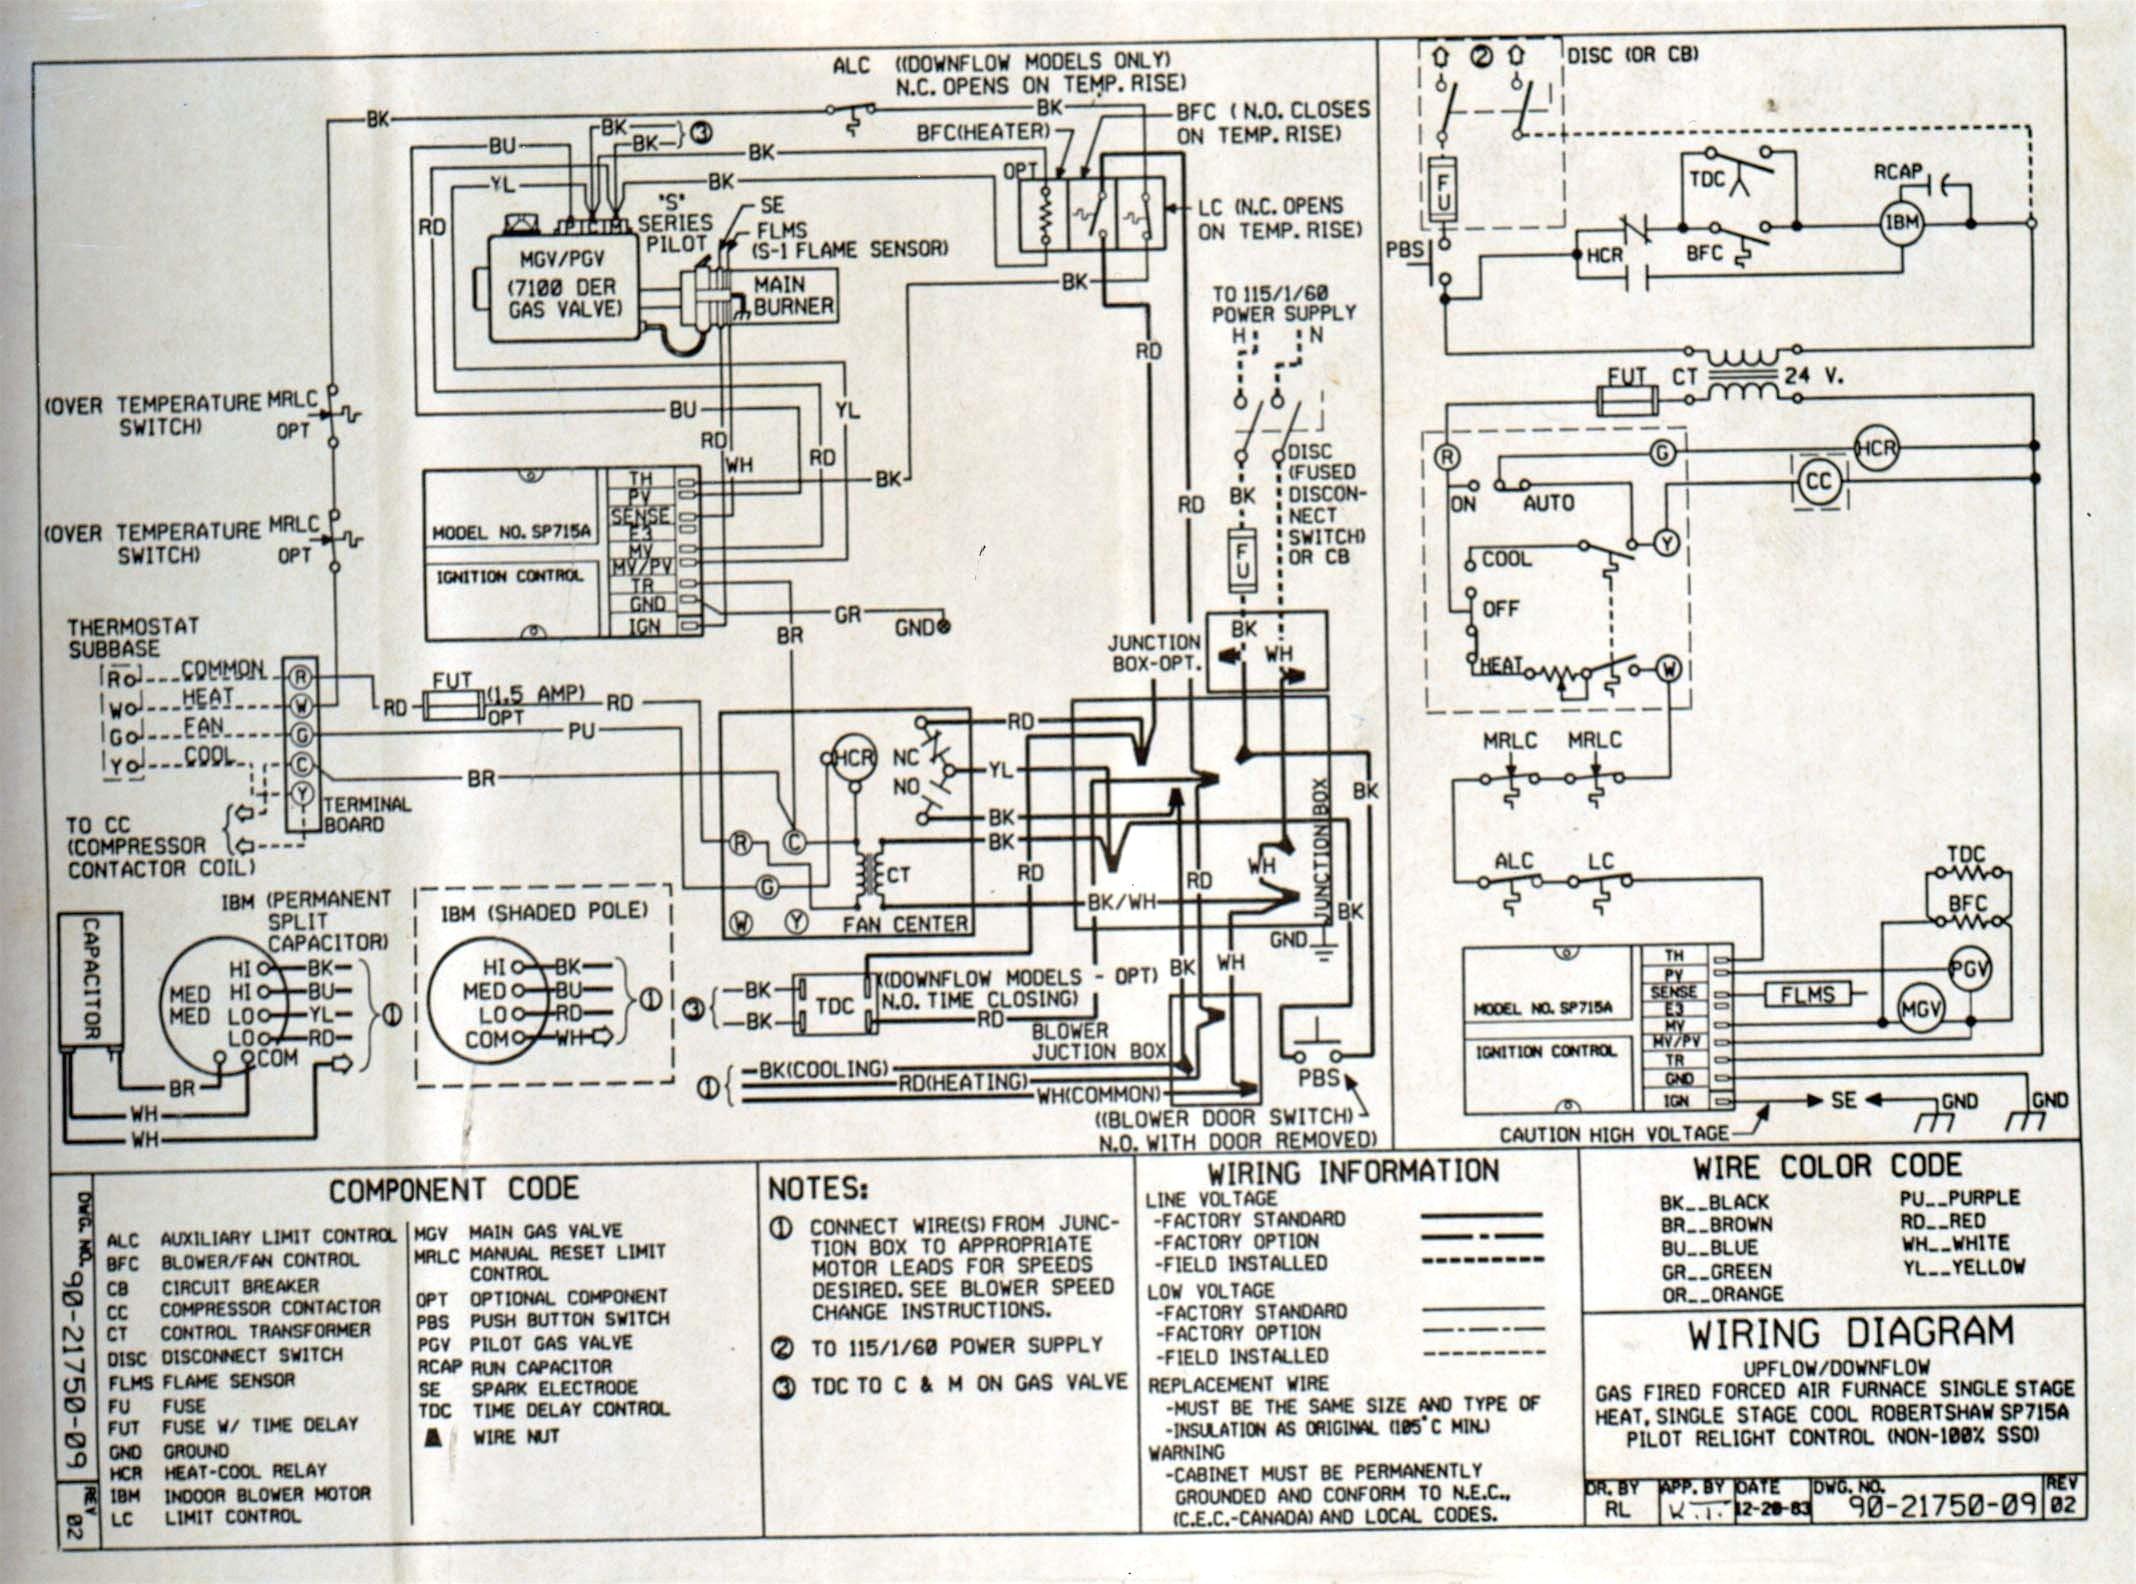 Hvac Blower Motor Wiring Diagram from detoxicrecenze.com